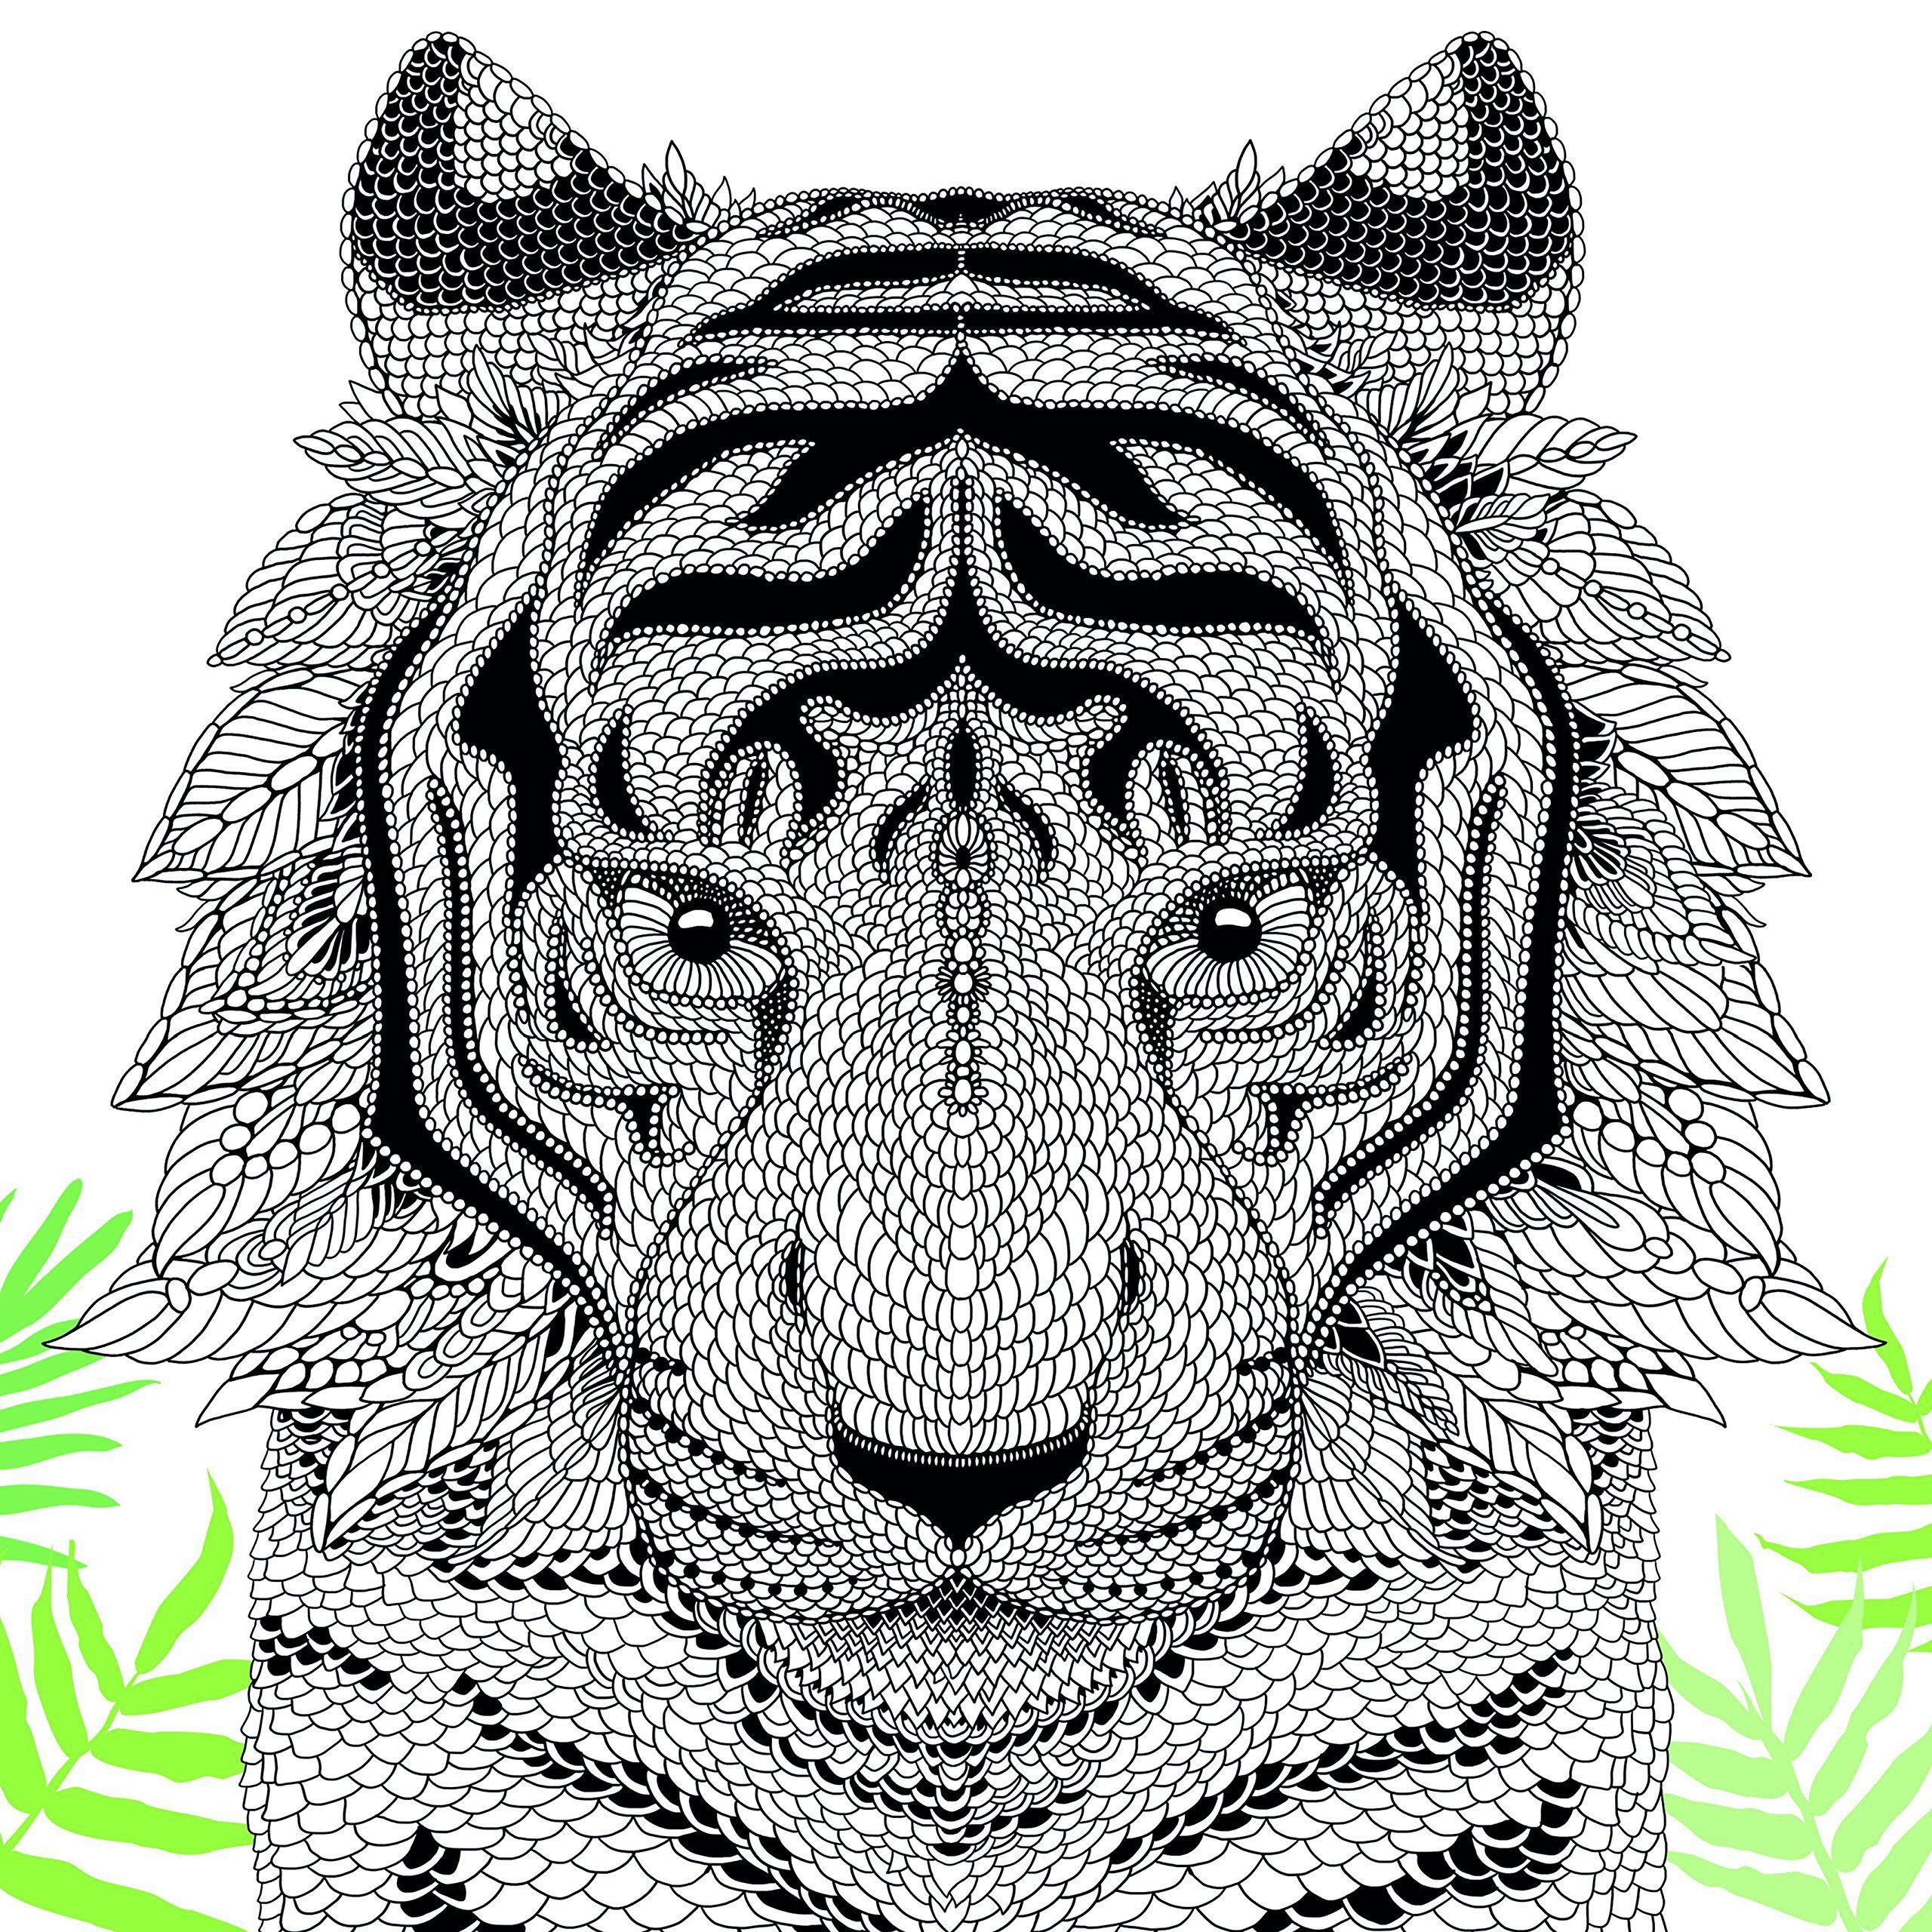 The Menagerie: Animal Portraits to Colour: Amazon.co.uk: Richard ...